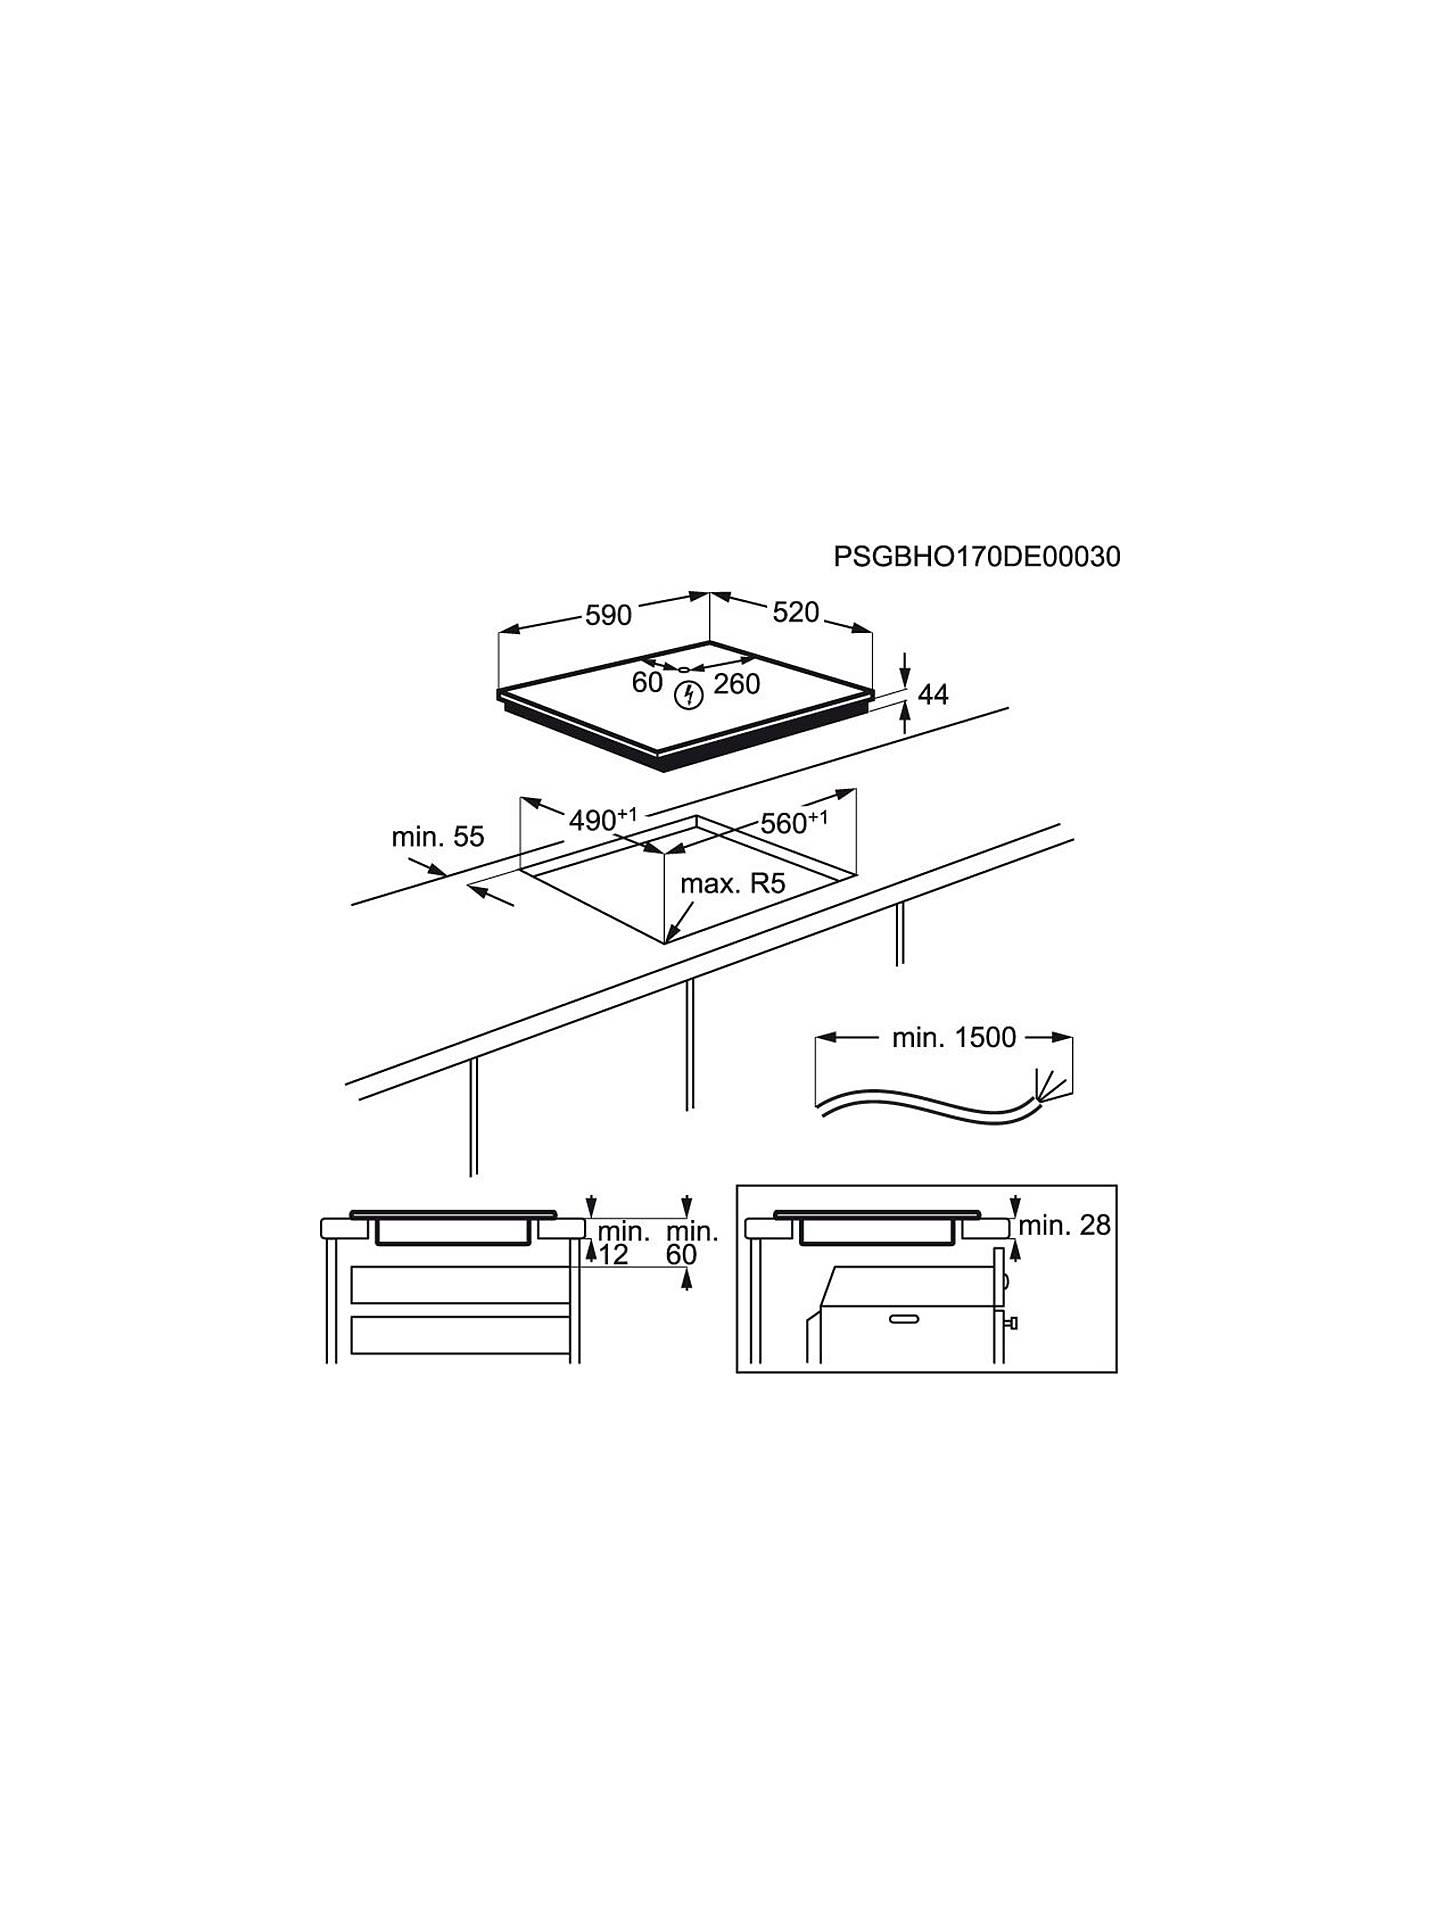 AEG IKE64450FB 59cm MaxiSense Induction Hob, Black on